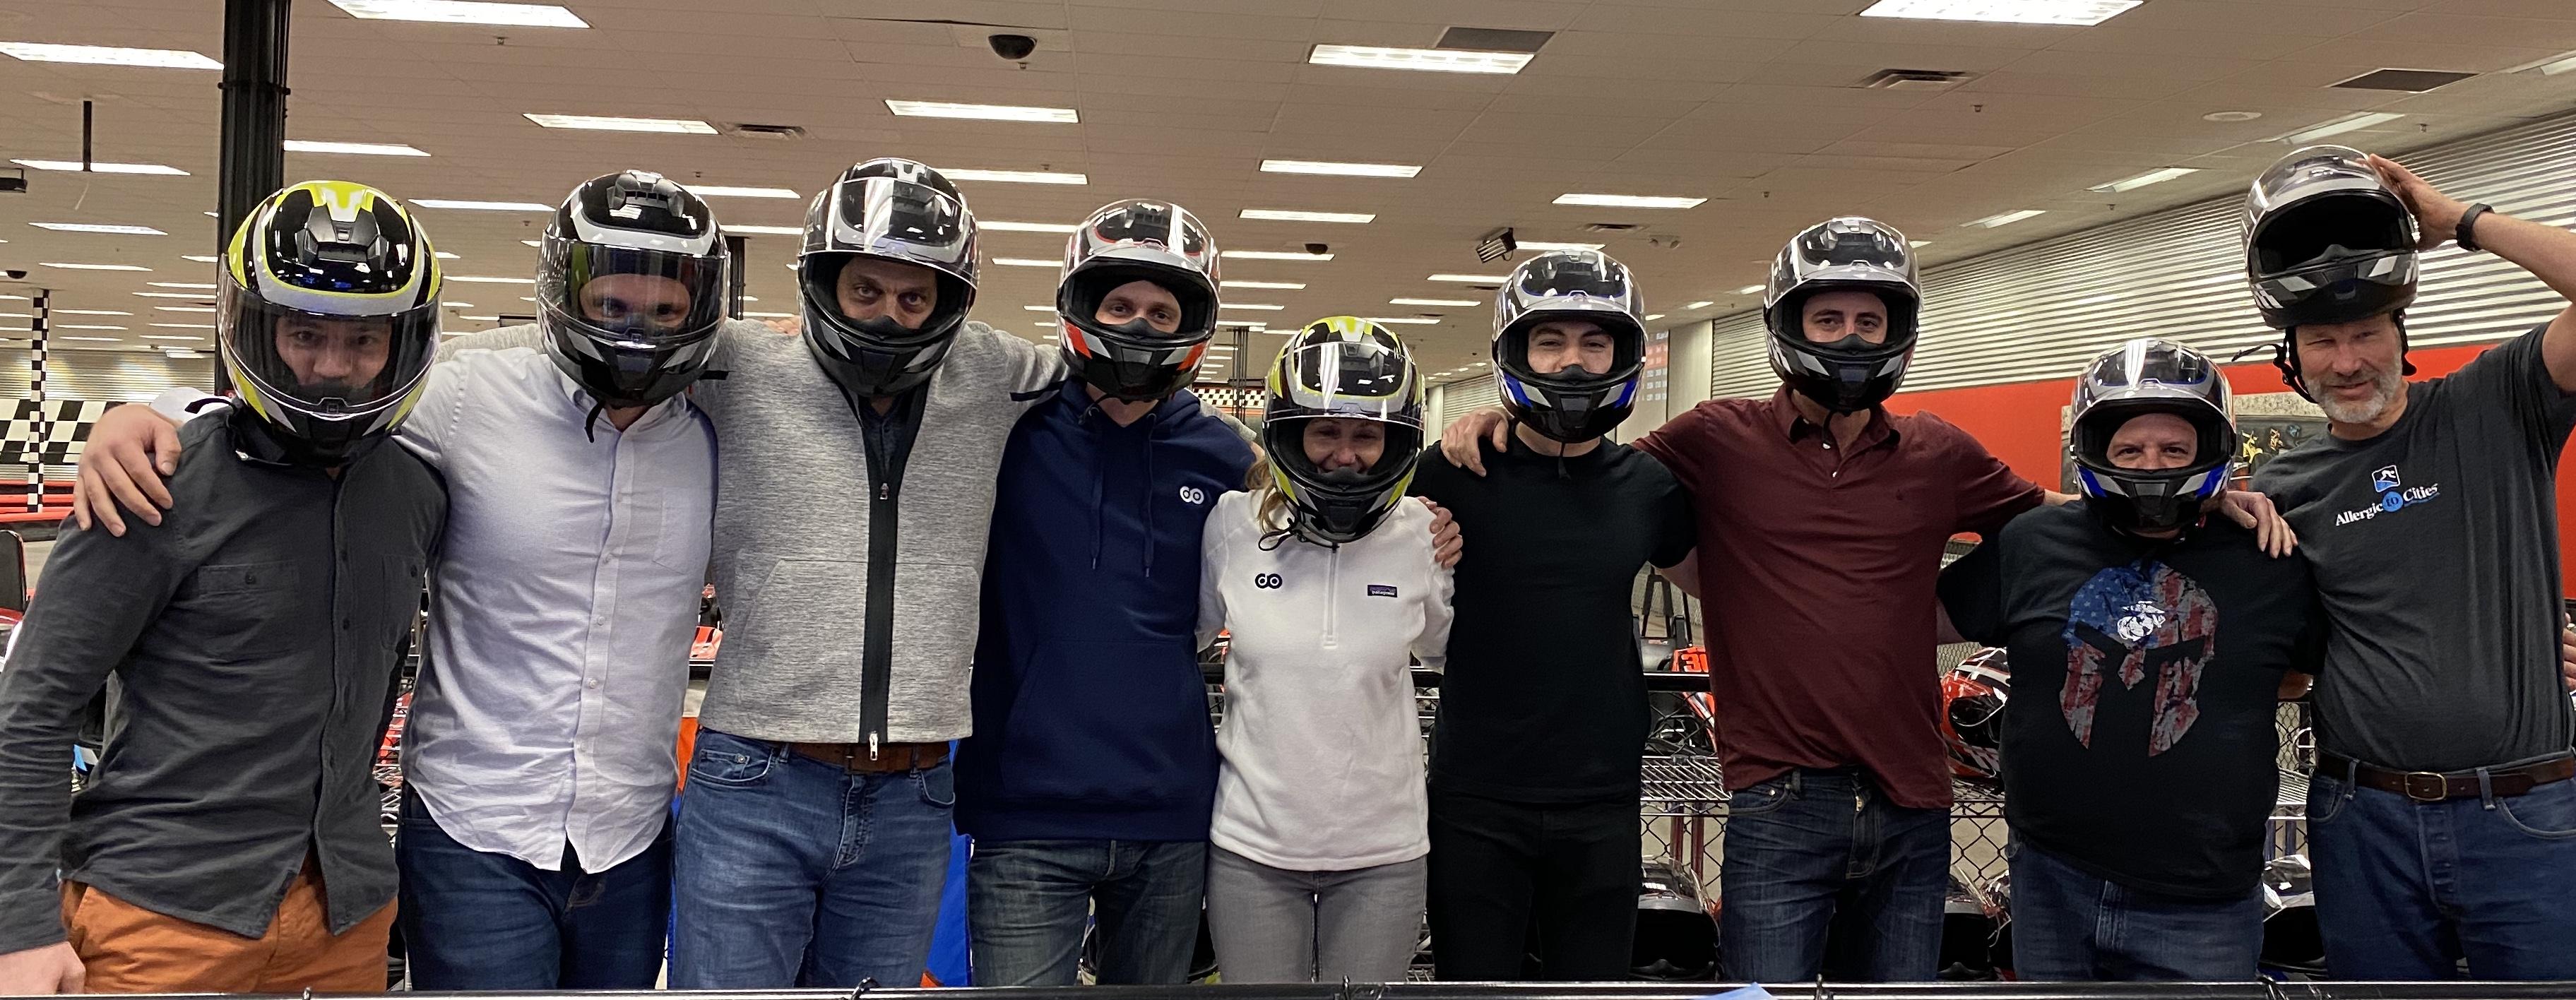 Team at Need 2 Speed event